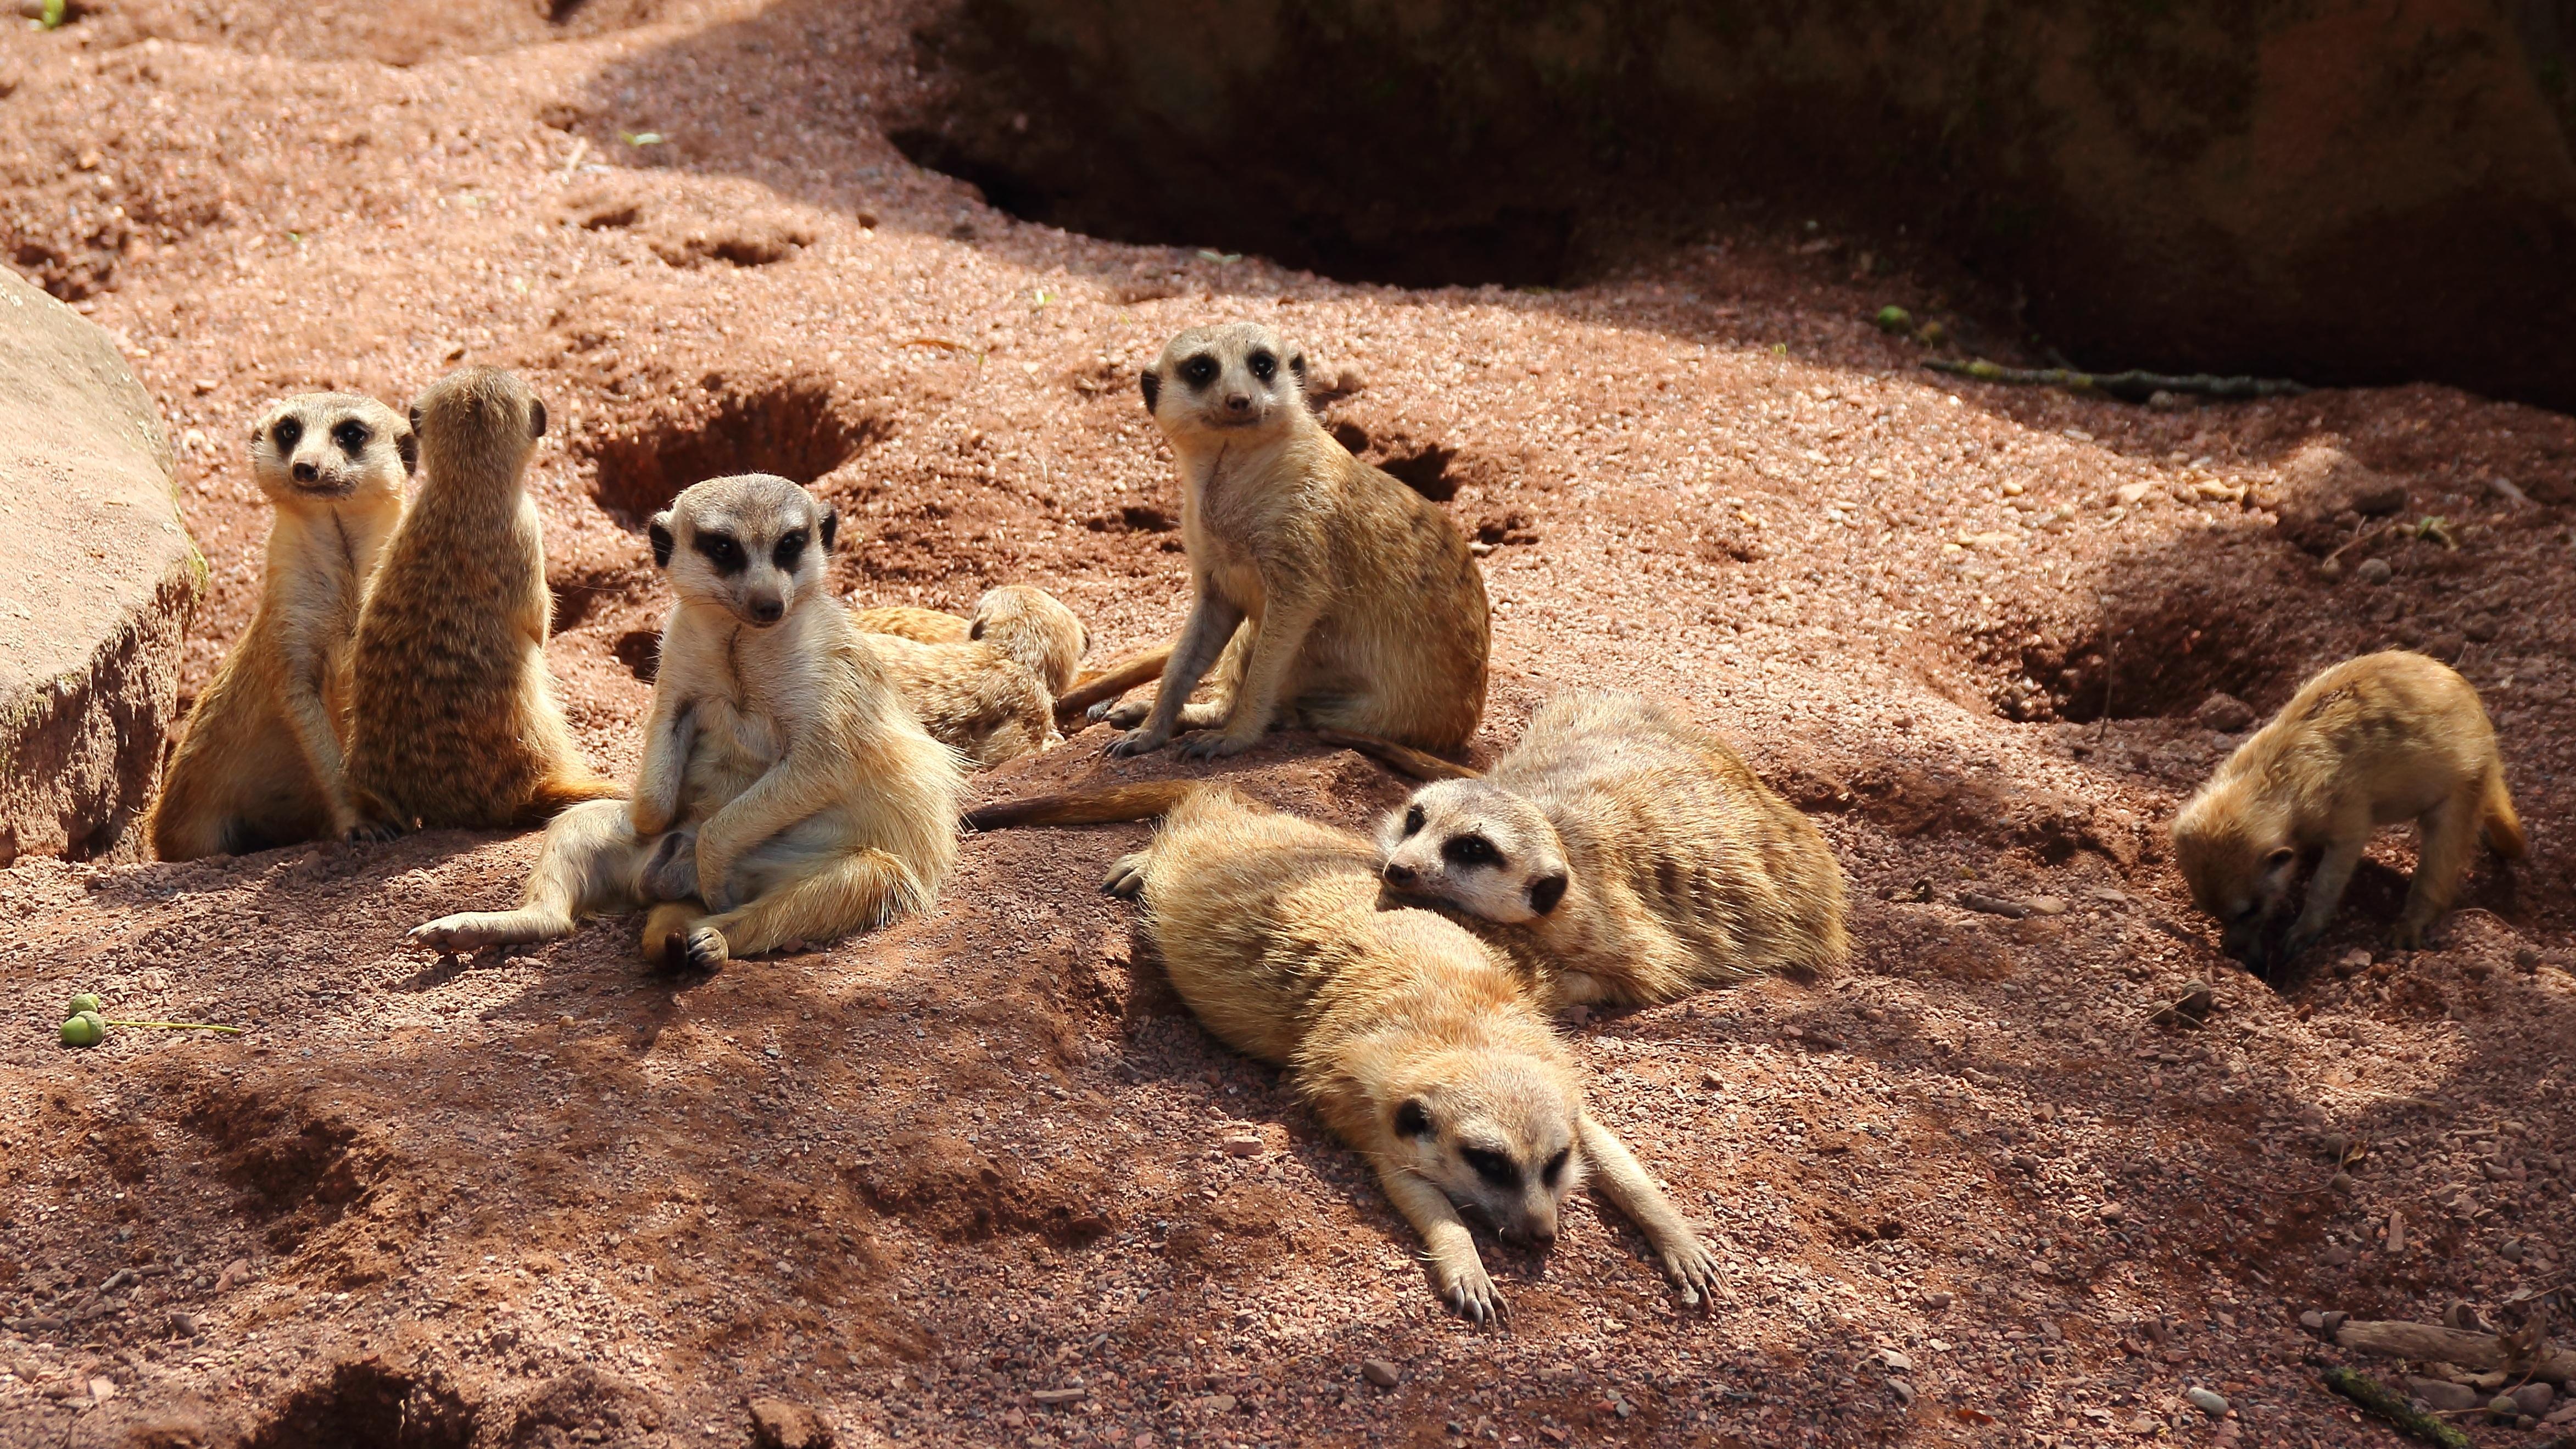 Meerkats 4k Ultra HD Wallpaper | Background Image ...